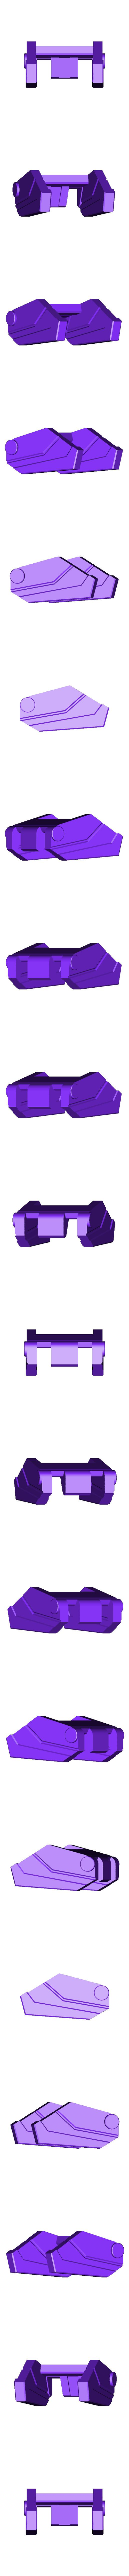 25_Drag_Body14_Spike1_GREY.stl Download STL file ARTICULATED DRAGONLORD (not Dragonzord) - NO SUPPORT • 3D printer model, Toymakr3D